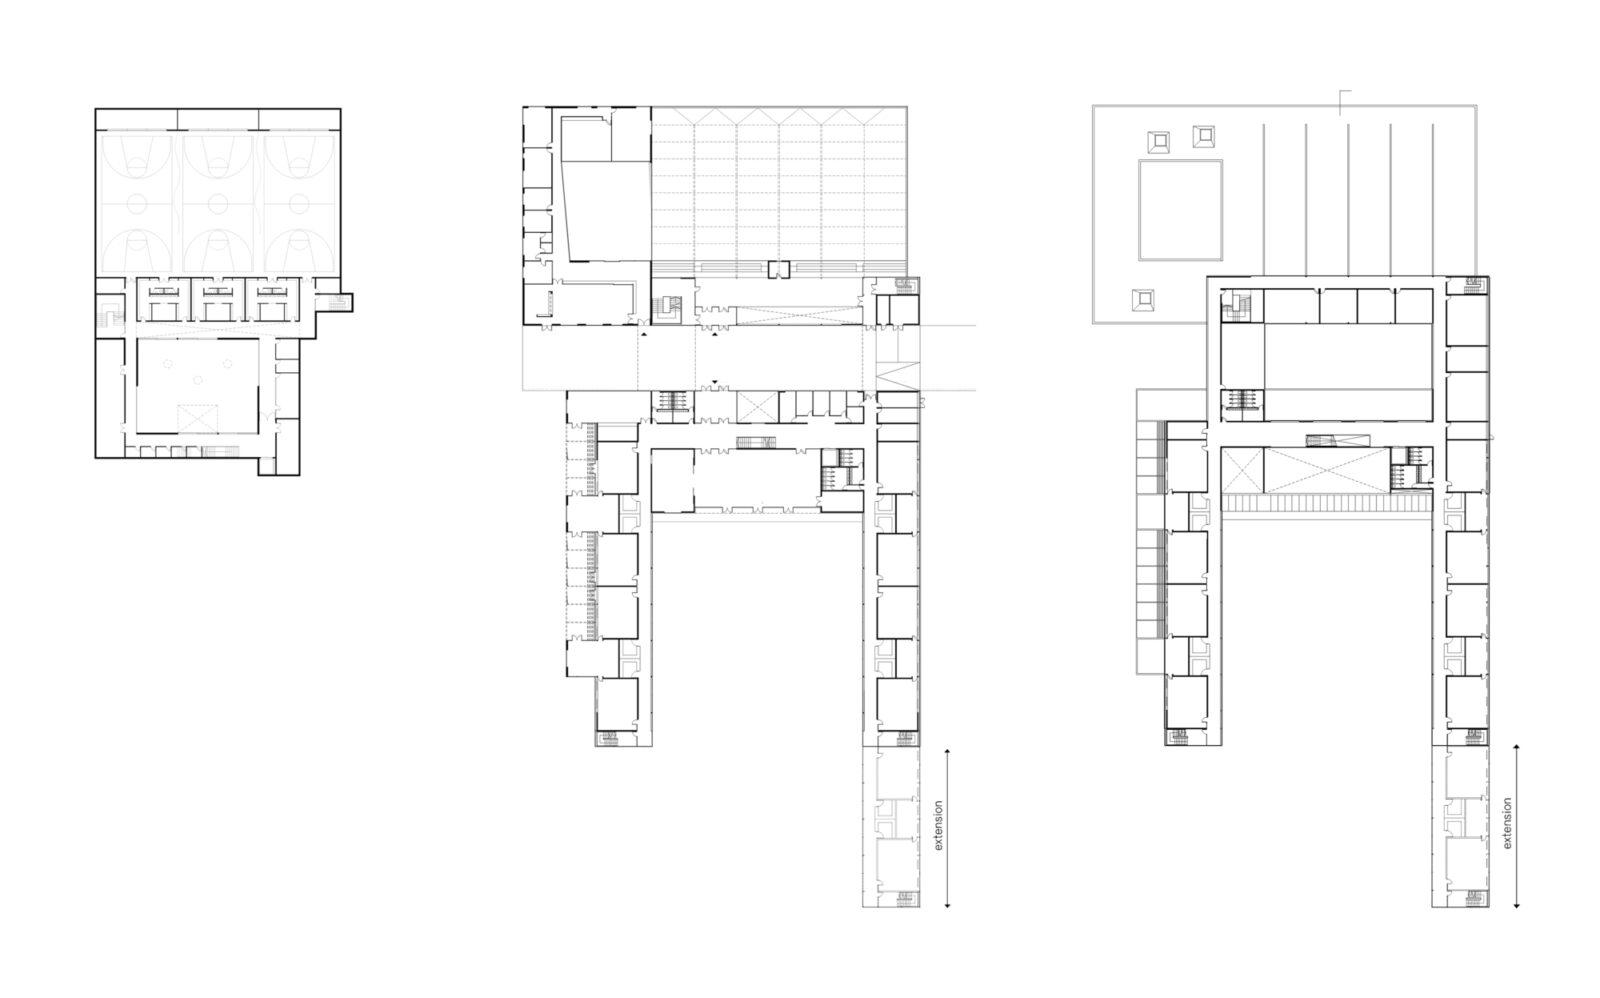 From Left — Lower Level Plan, Ground Floor Plan, Upper Floor Plan